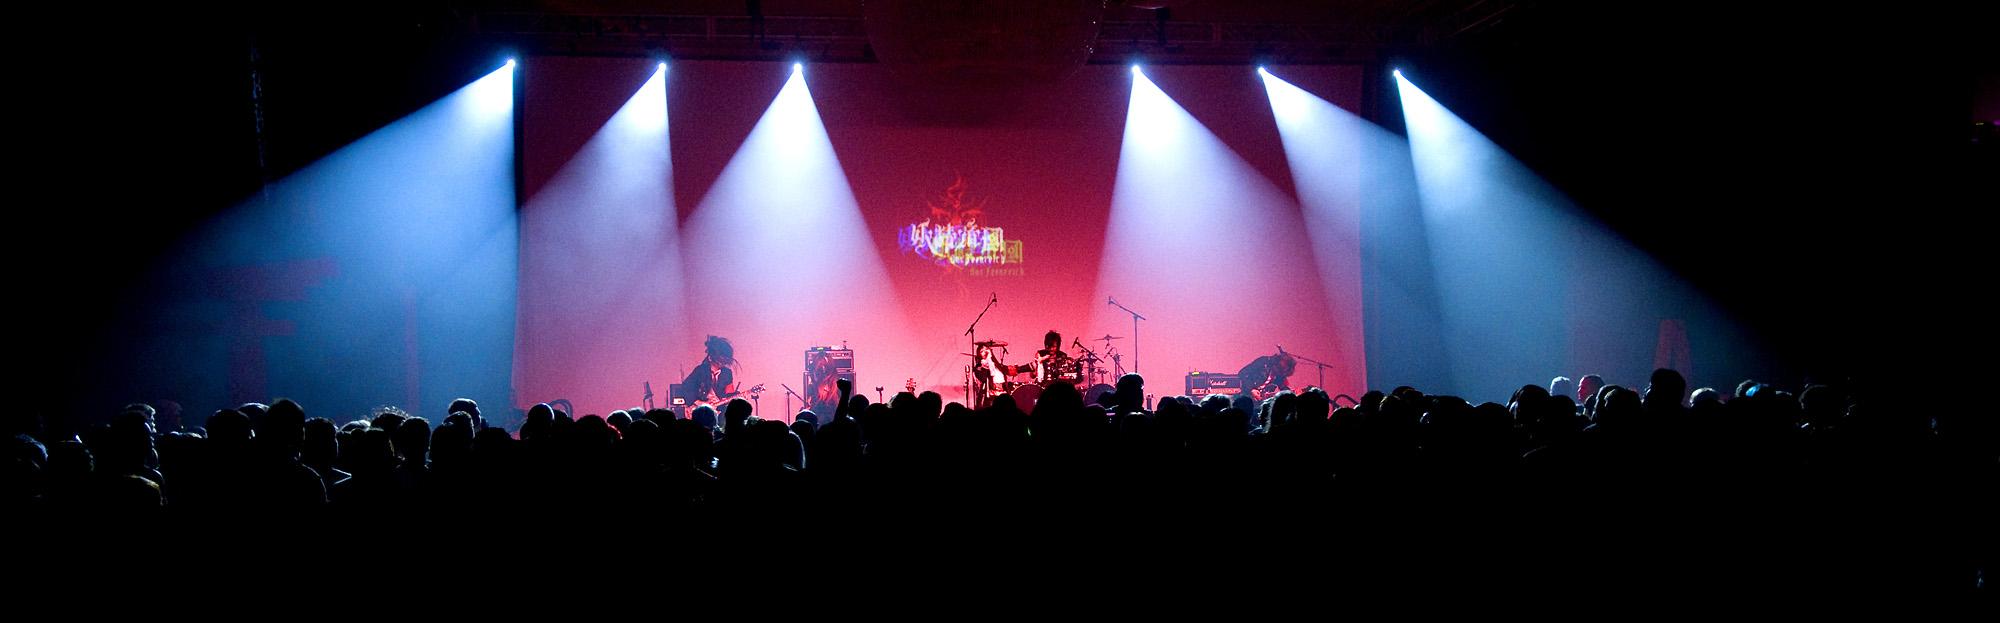 JRock247-Yousei-Teikoku-A-Kon-2016-F1966-2000